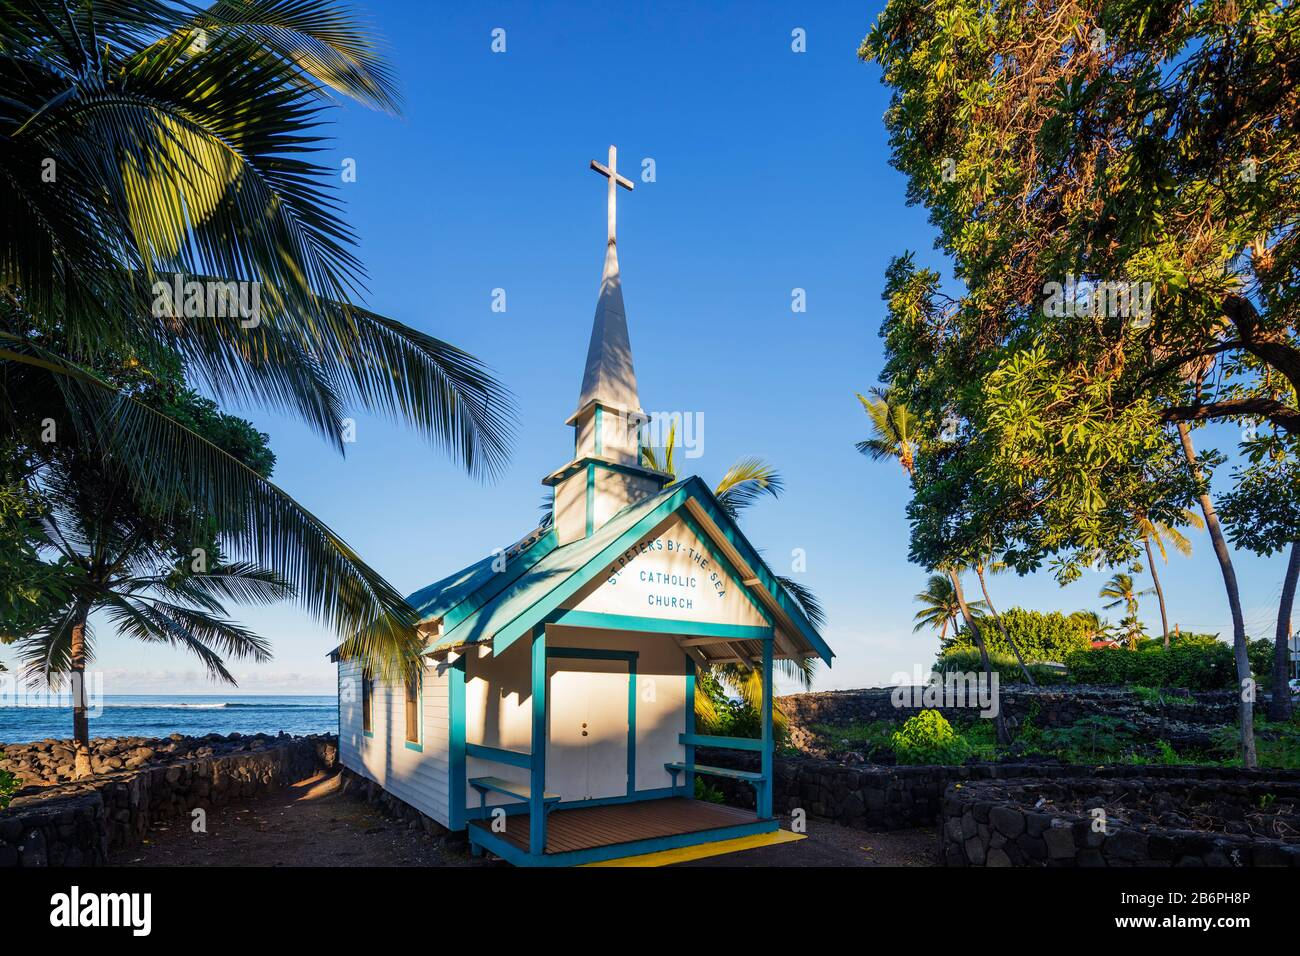 USA, Hawaii, Big Island, Kona, St Peter's by the Sea Catholic Church Stockfoto